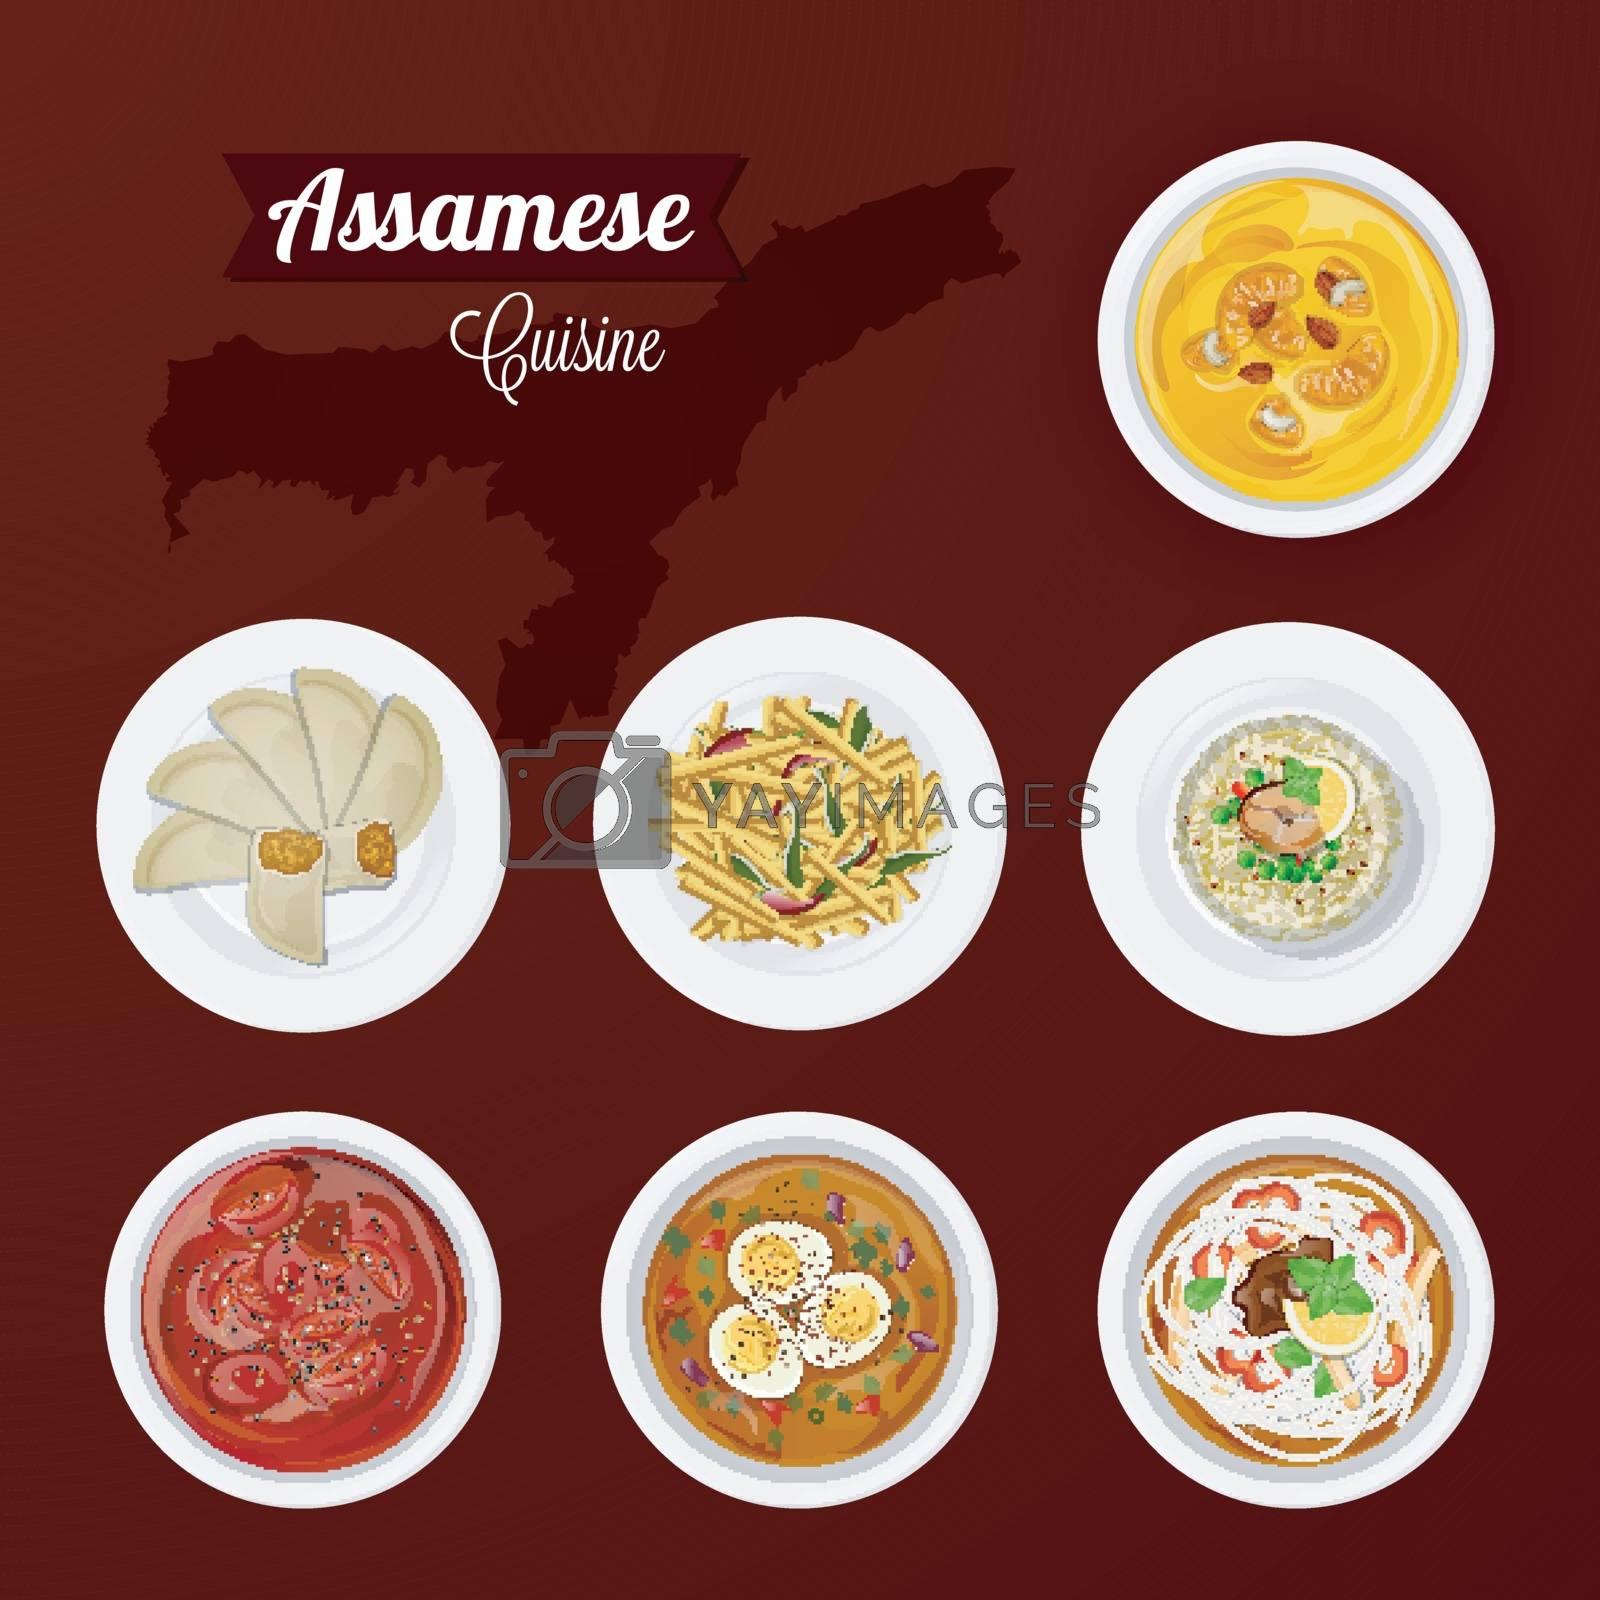 Assamese cuisine view of delicious cuisine for restaurant. by aispl